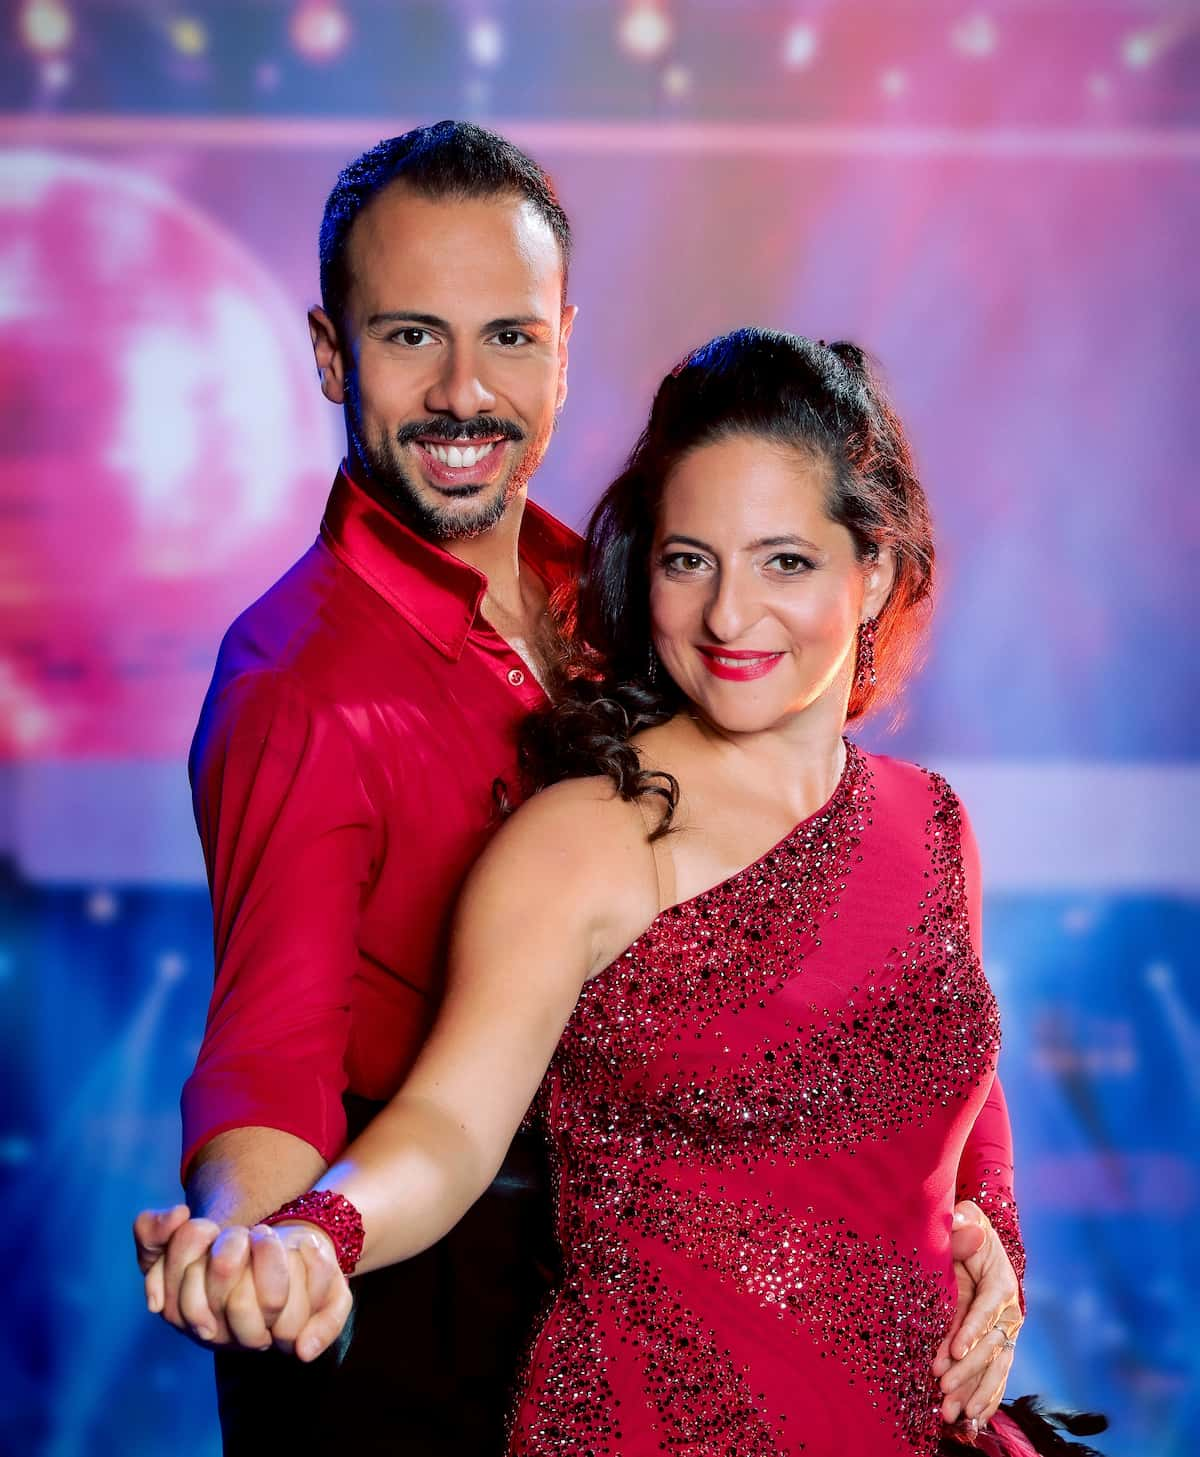 Caroline Athanasiadis - Danilo Campisi beim Start der Dancing Stars am 24.9.2021